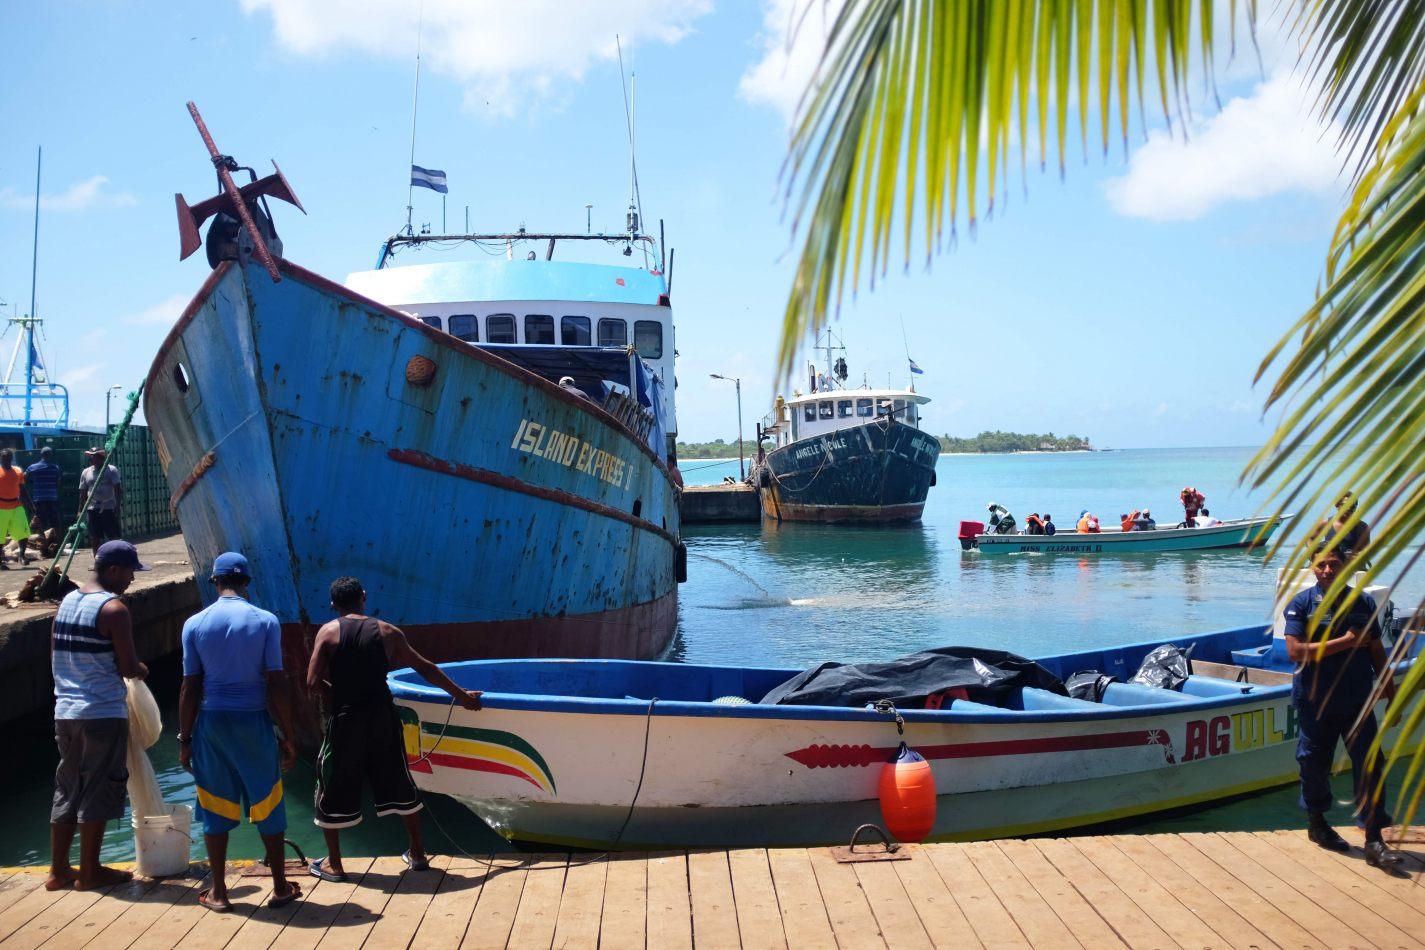 Hibiscus & Nomada : Corn Islands - Ferry Dock Big Corn Island